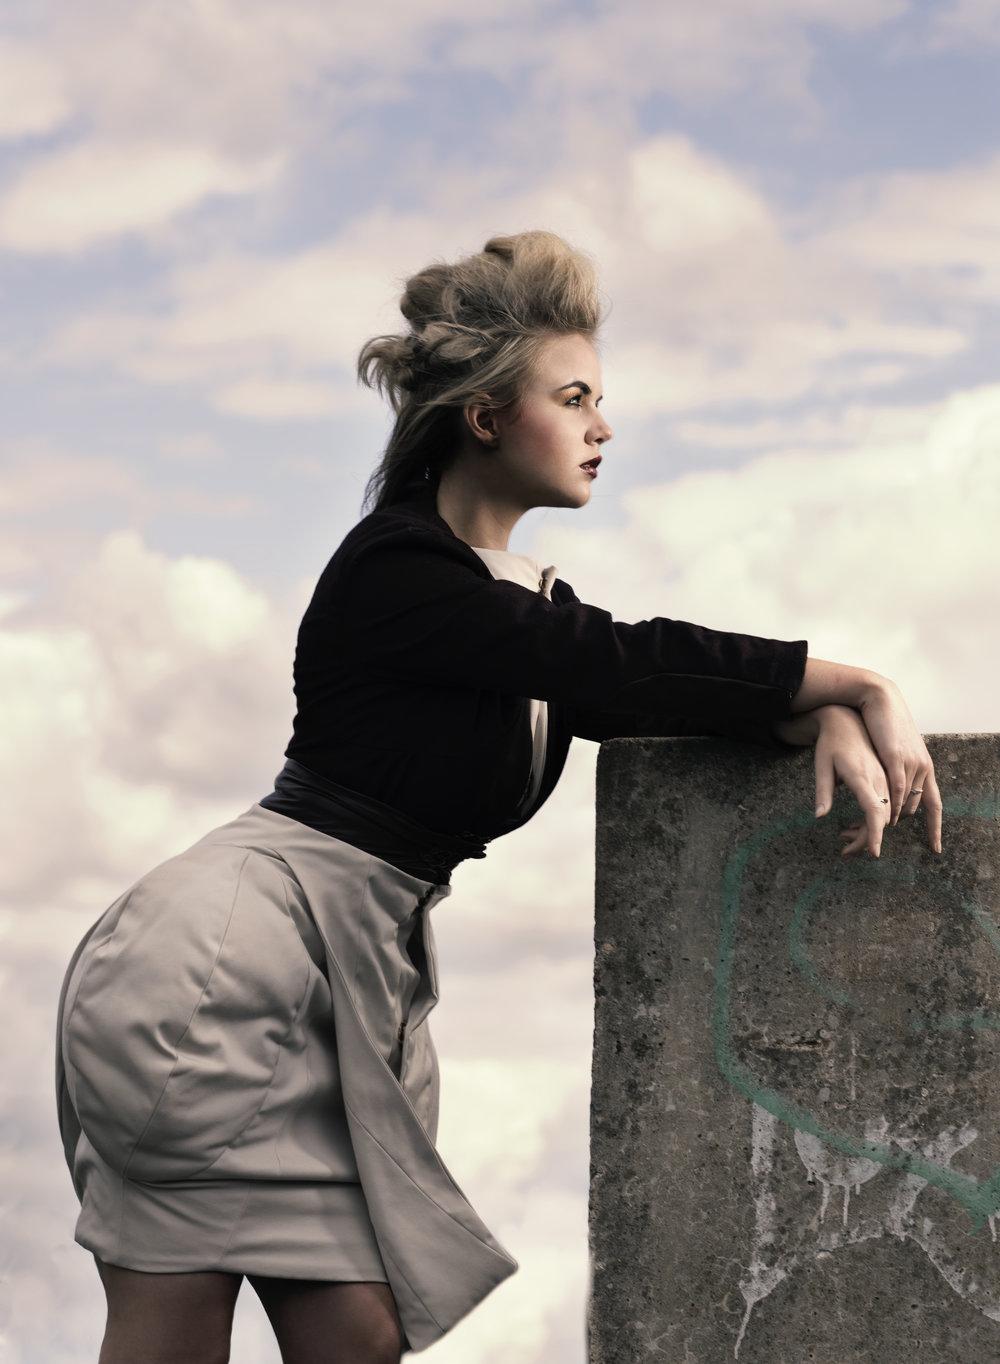 zaramia-ava-zaramiaava-leeds-fashion-designer-ethical-sustainable-taupe-versatile-drape-wrap-top-cowl-structure-padding-burgundy-crop-jacket-styling-location-womenswear-photoshoot-4